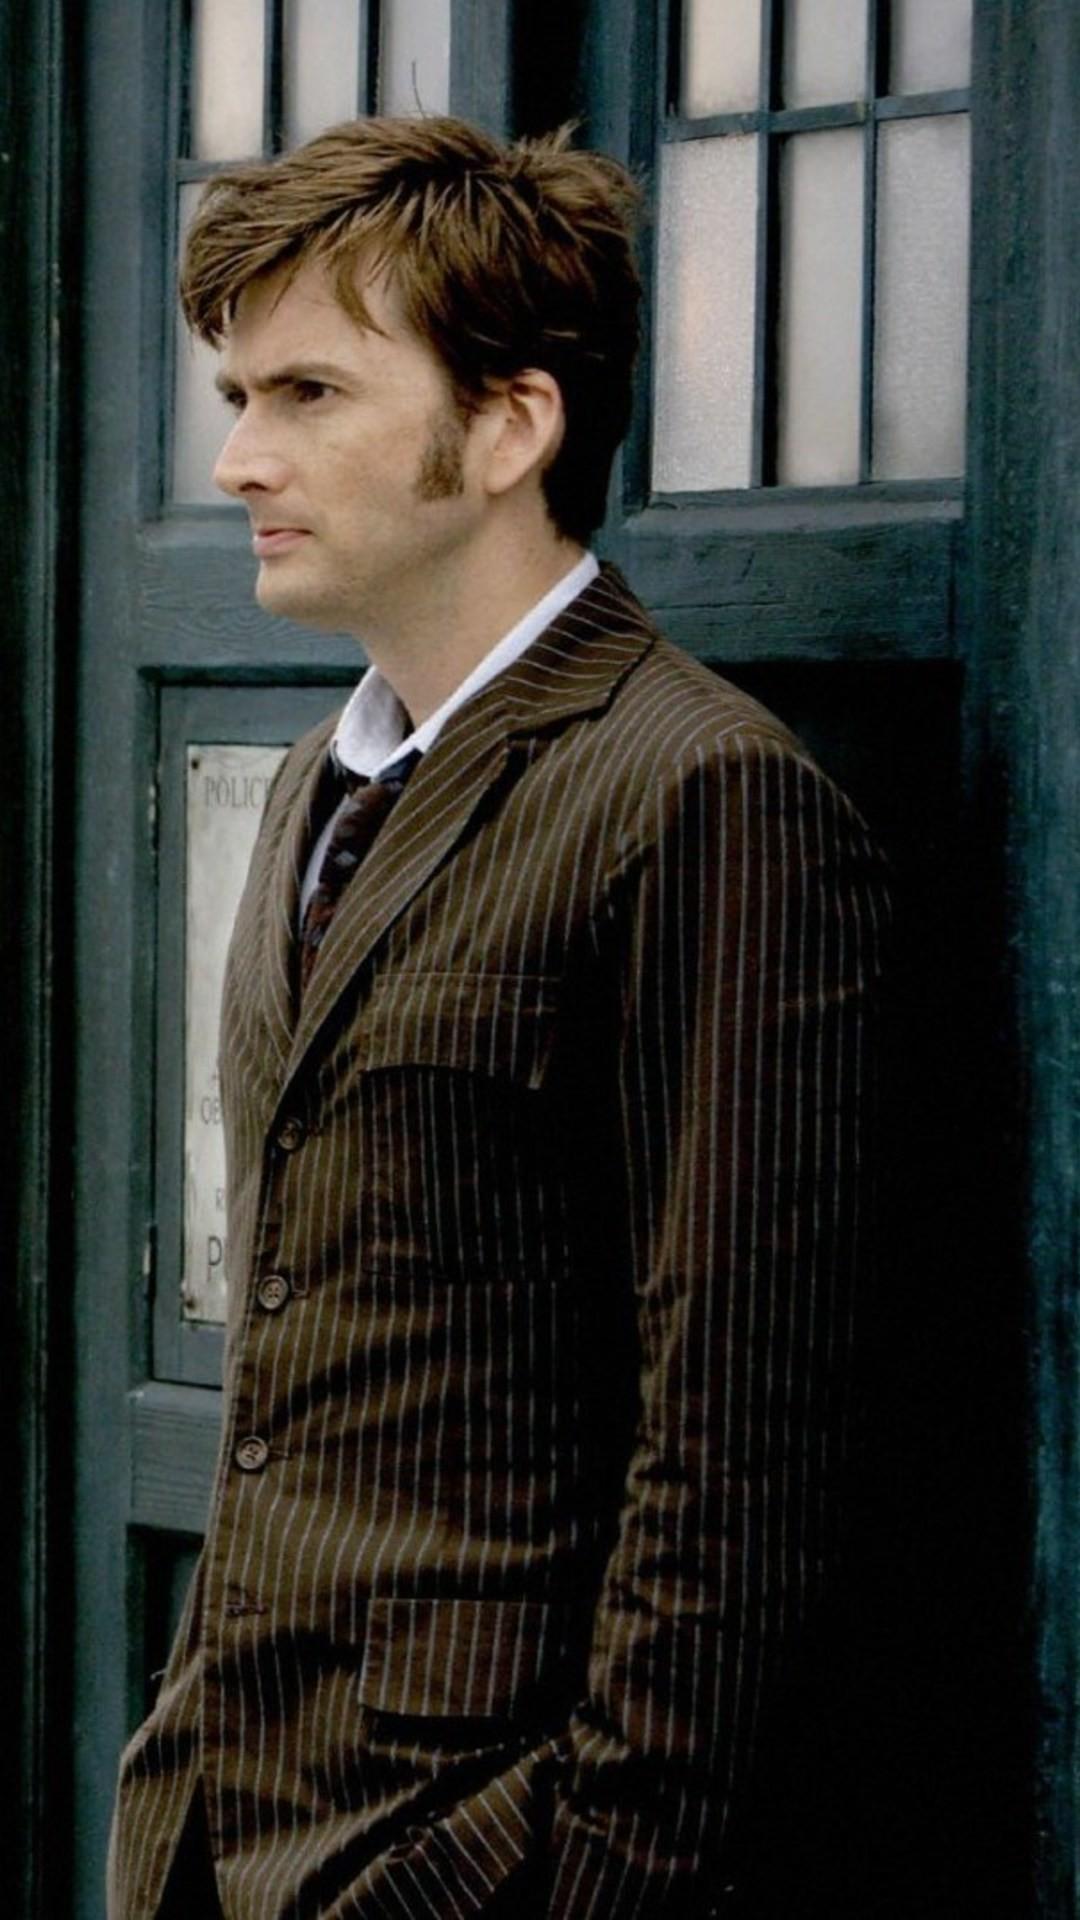 david-tennant-in-doctor-who-wallpaper.jpg